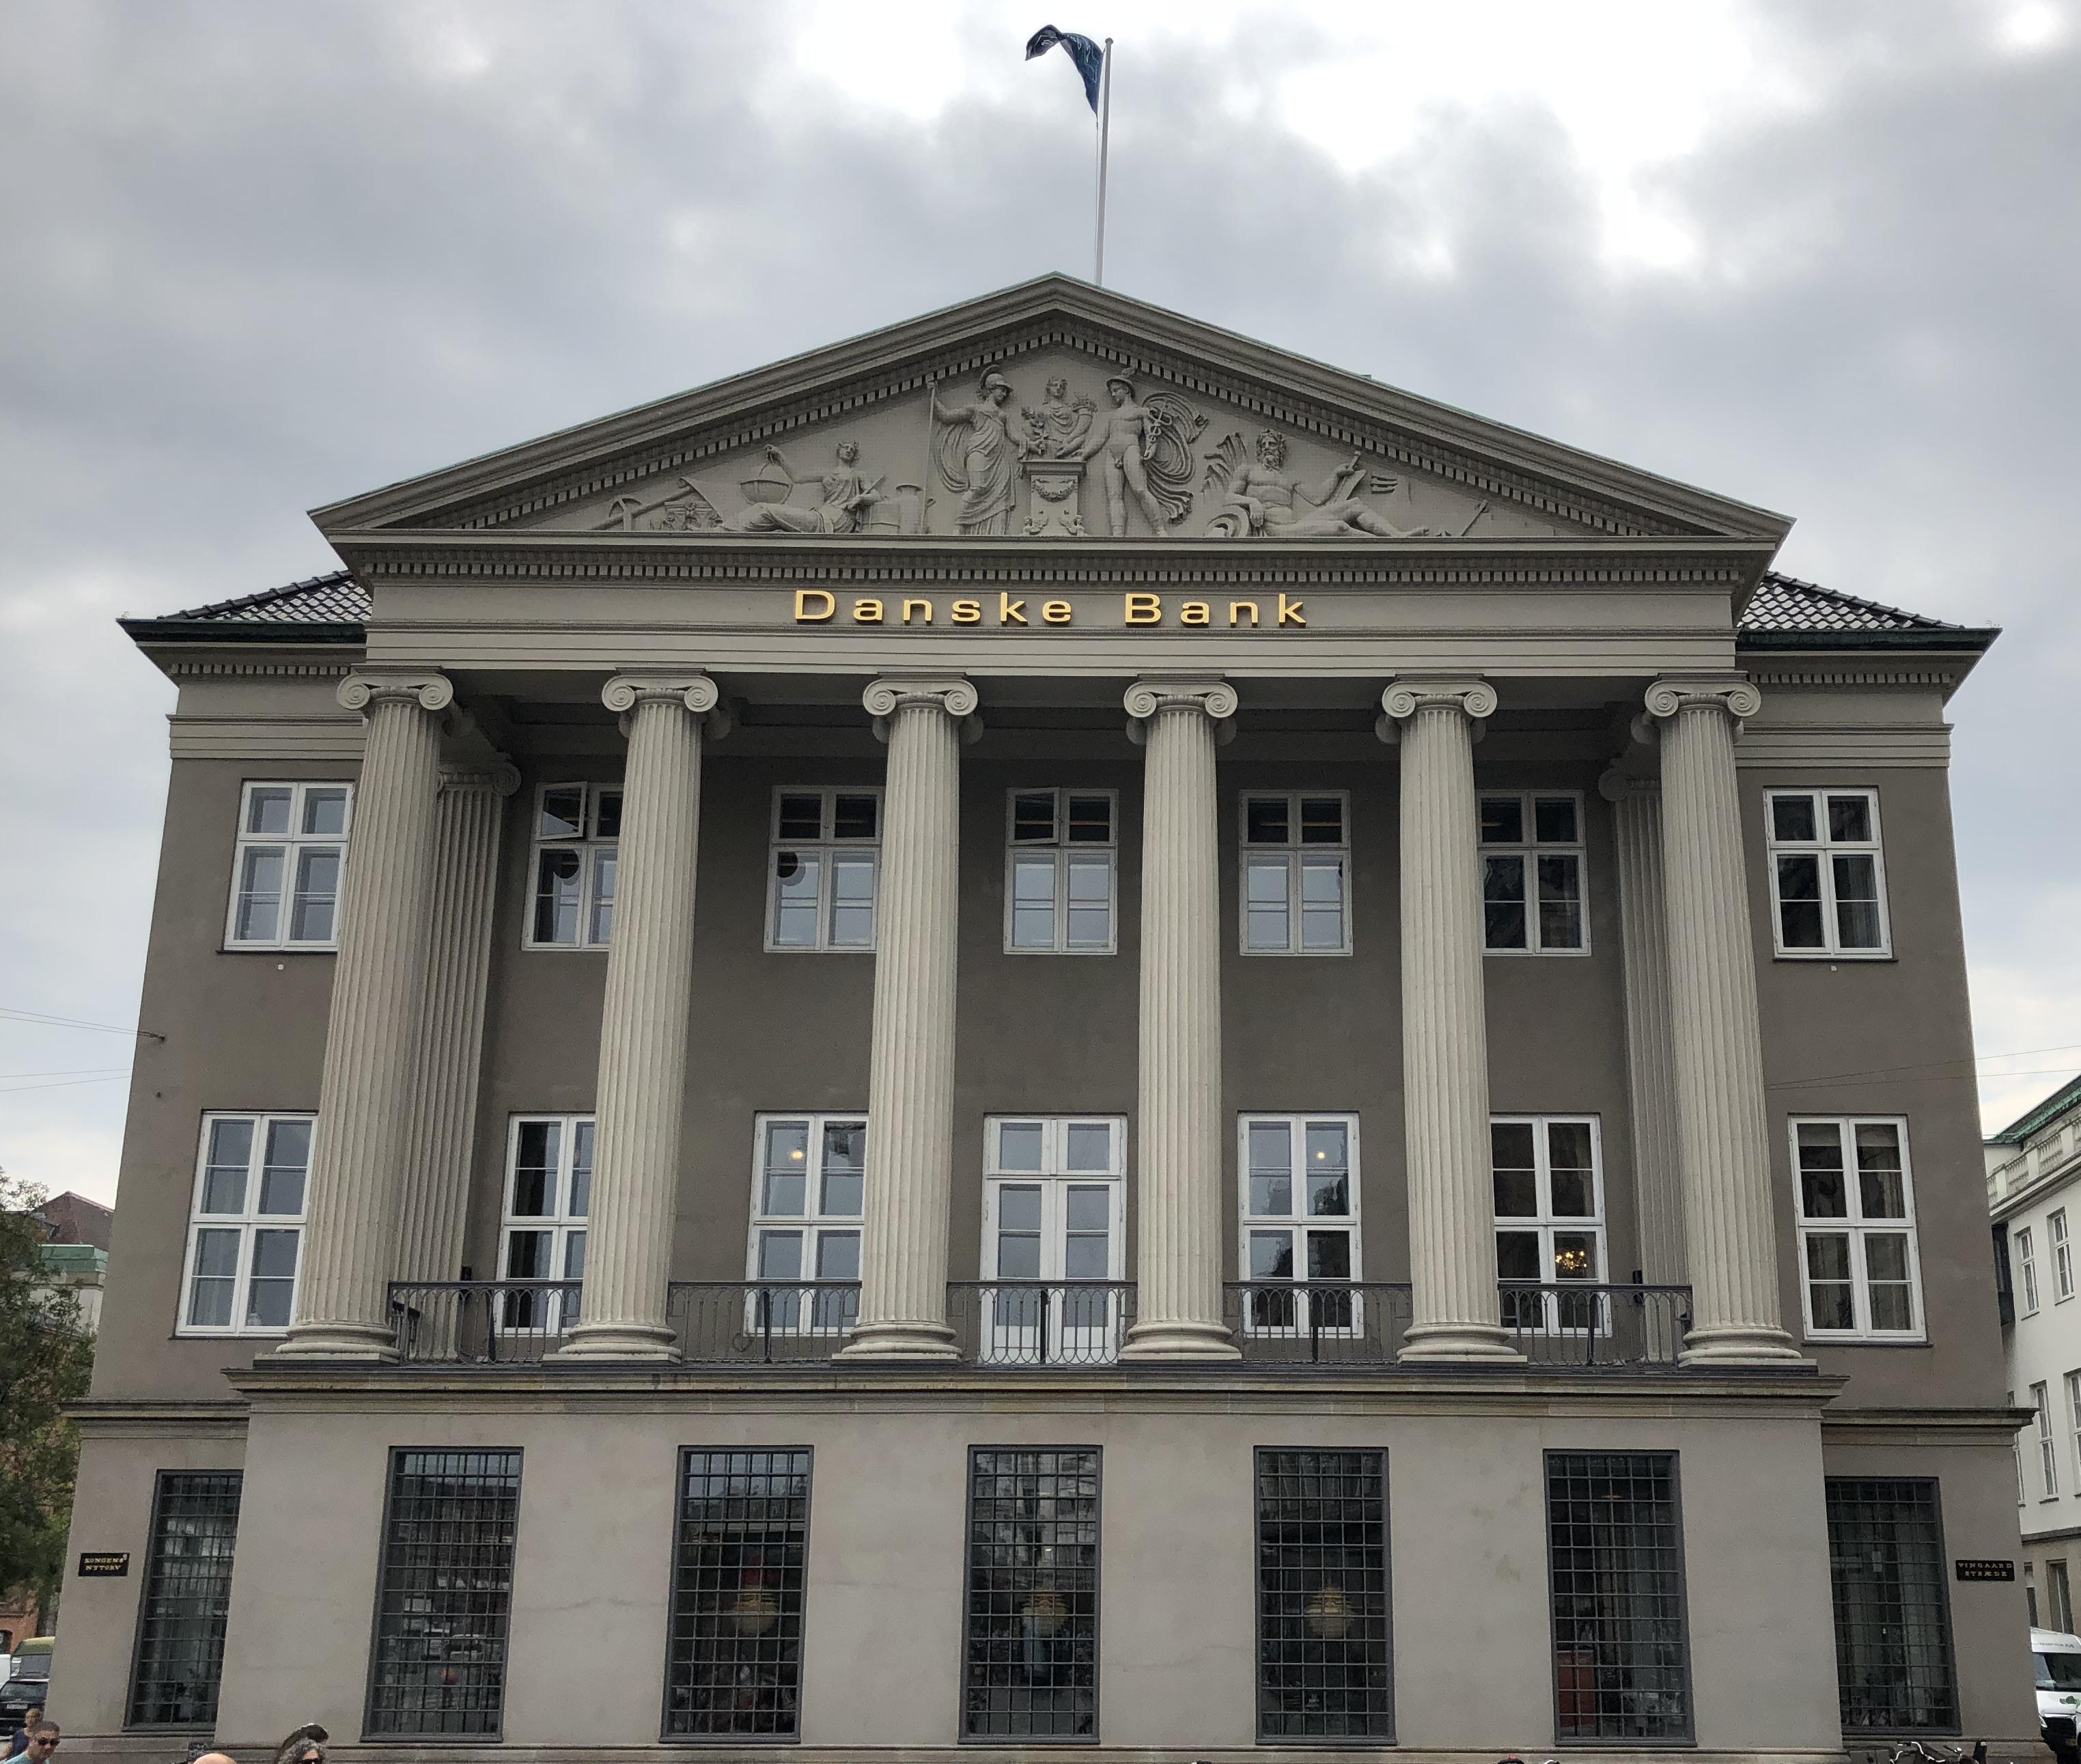 danske bank bangalore captive definition